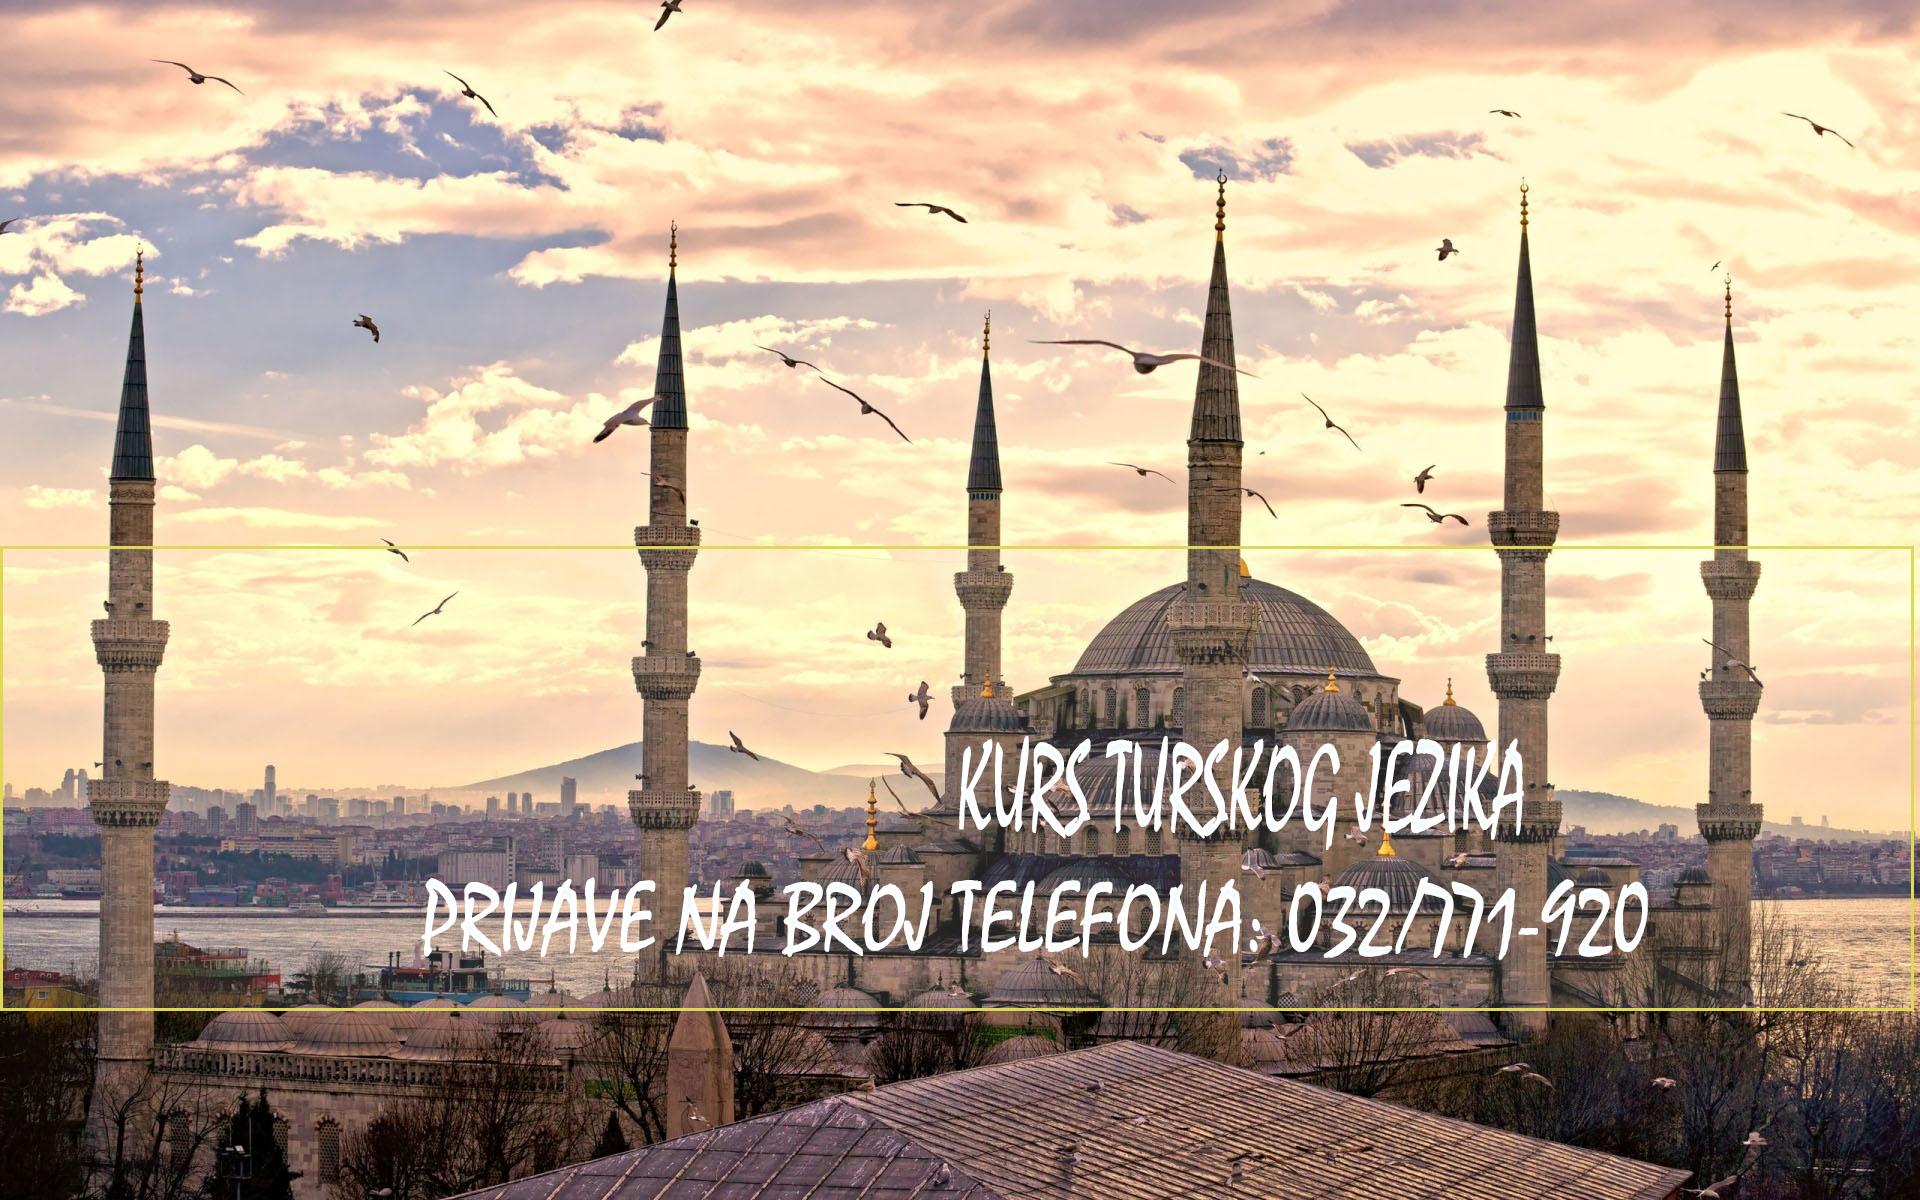 JU KSC KAKANJ ORGANIZUJE: KURS TURSKOG JEZIKA NIVO A1